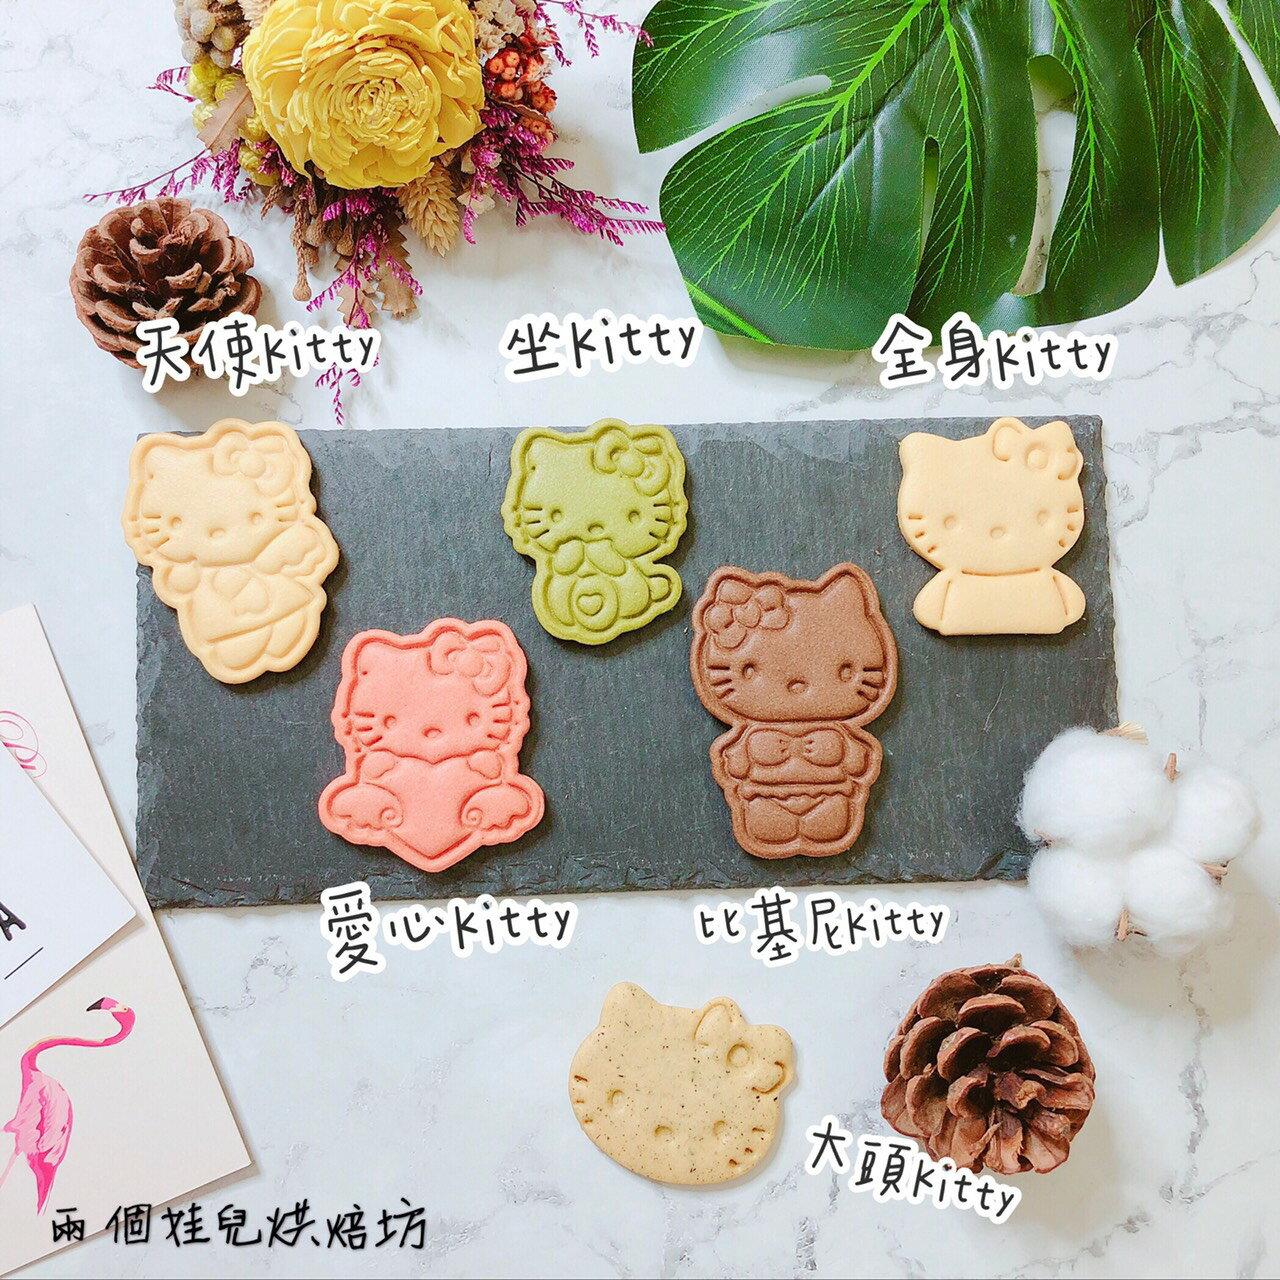 Kitty造型手工餅乾 比基尼Kitty餅乾 婚禮二進小物 桌上禮 喜餅 彌月禮盒